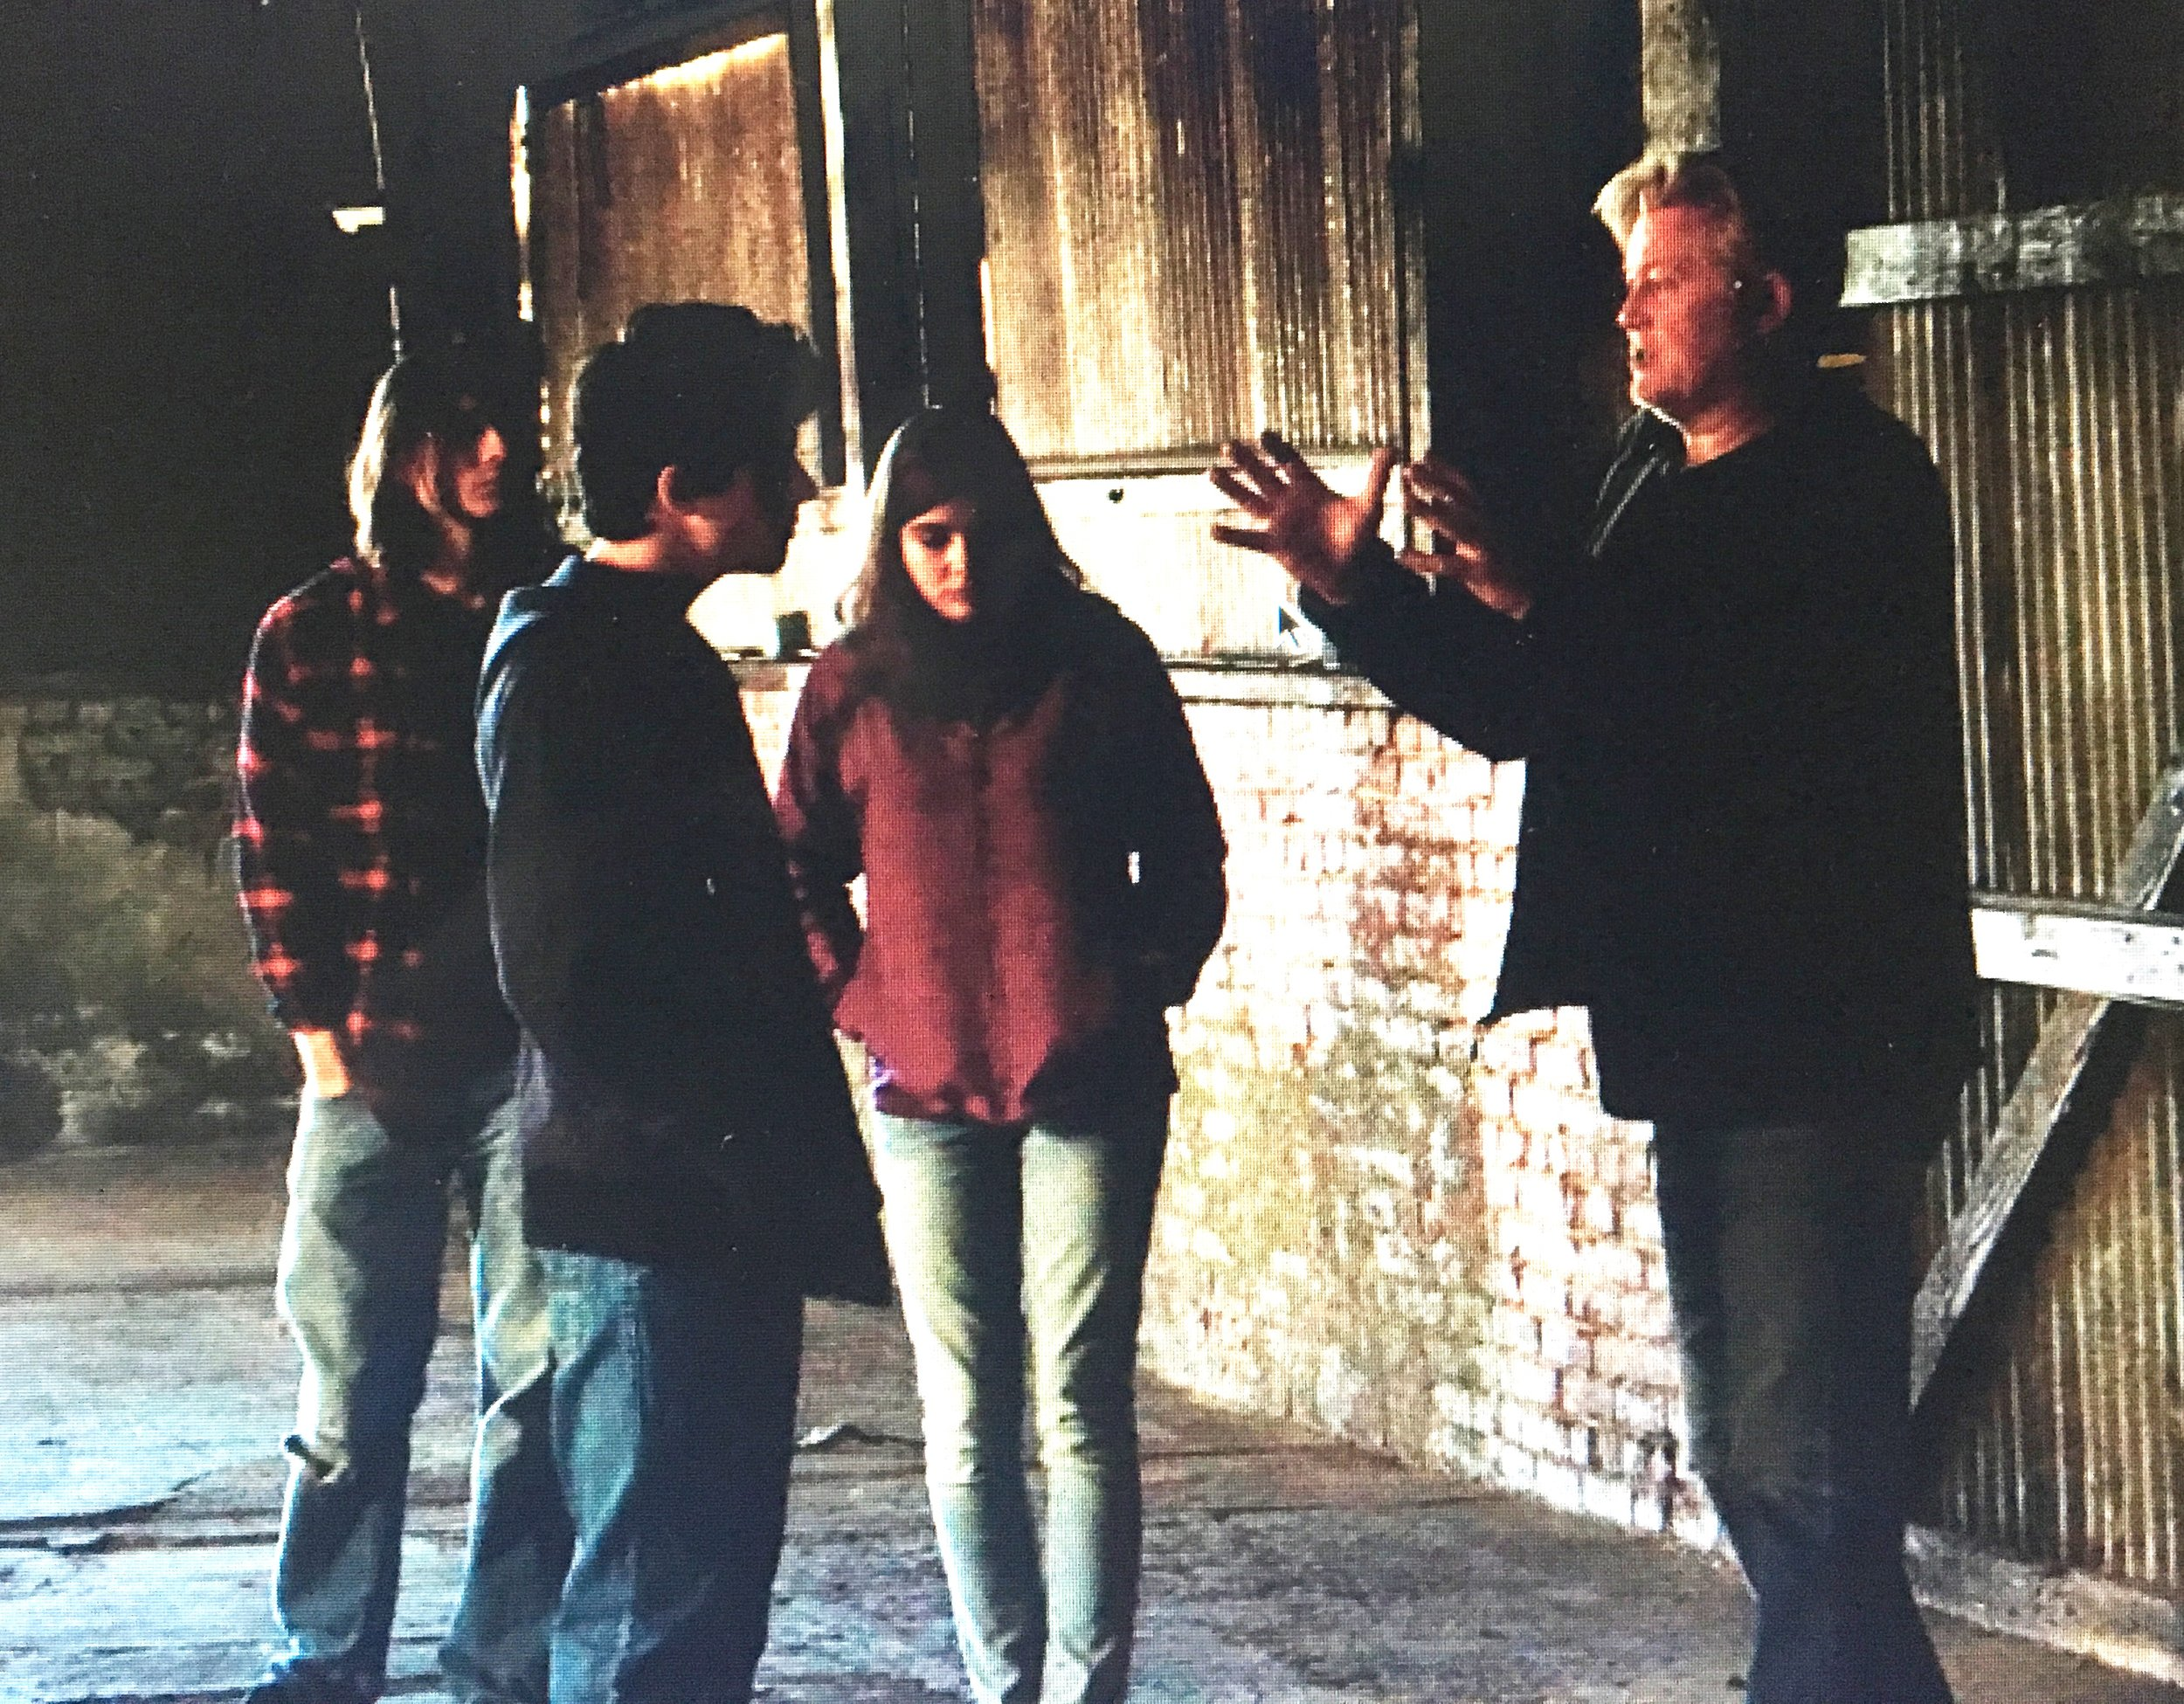 Directing Rhys Matthew Bond on Michael Vey Cell 25